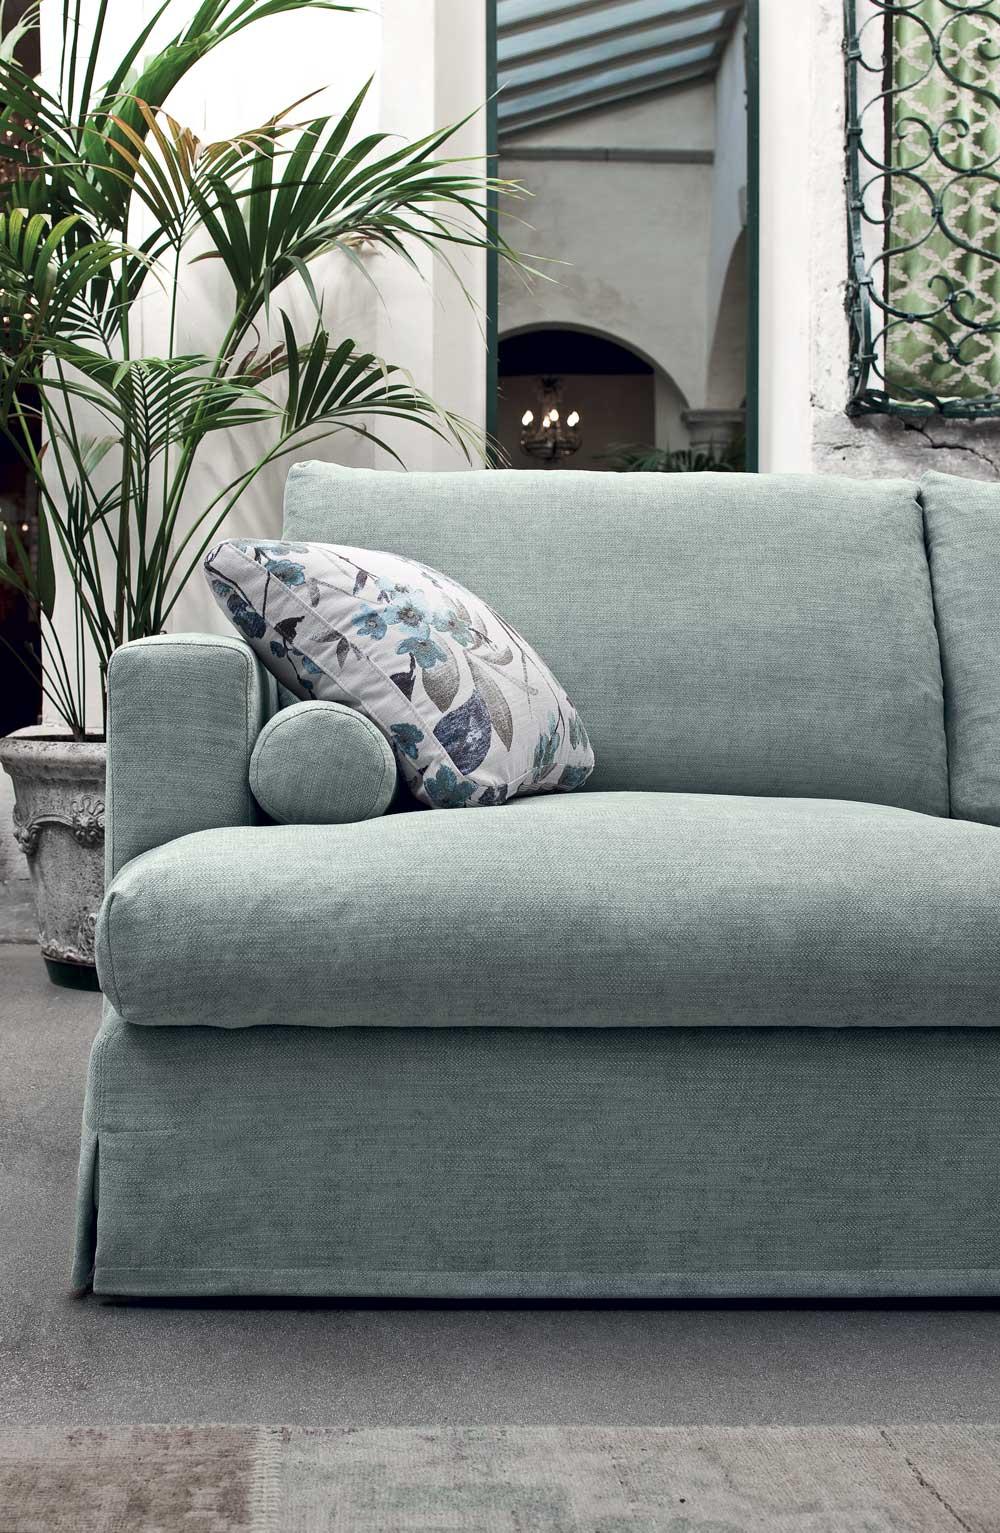 Arizona divano design moderno in tessuto o ecopelle - Divano moderno design ...